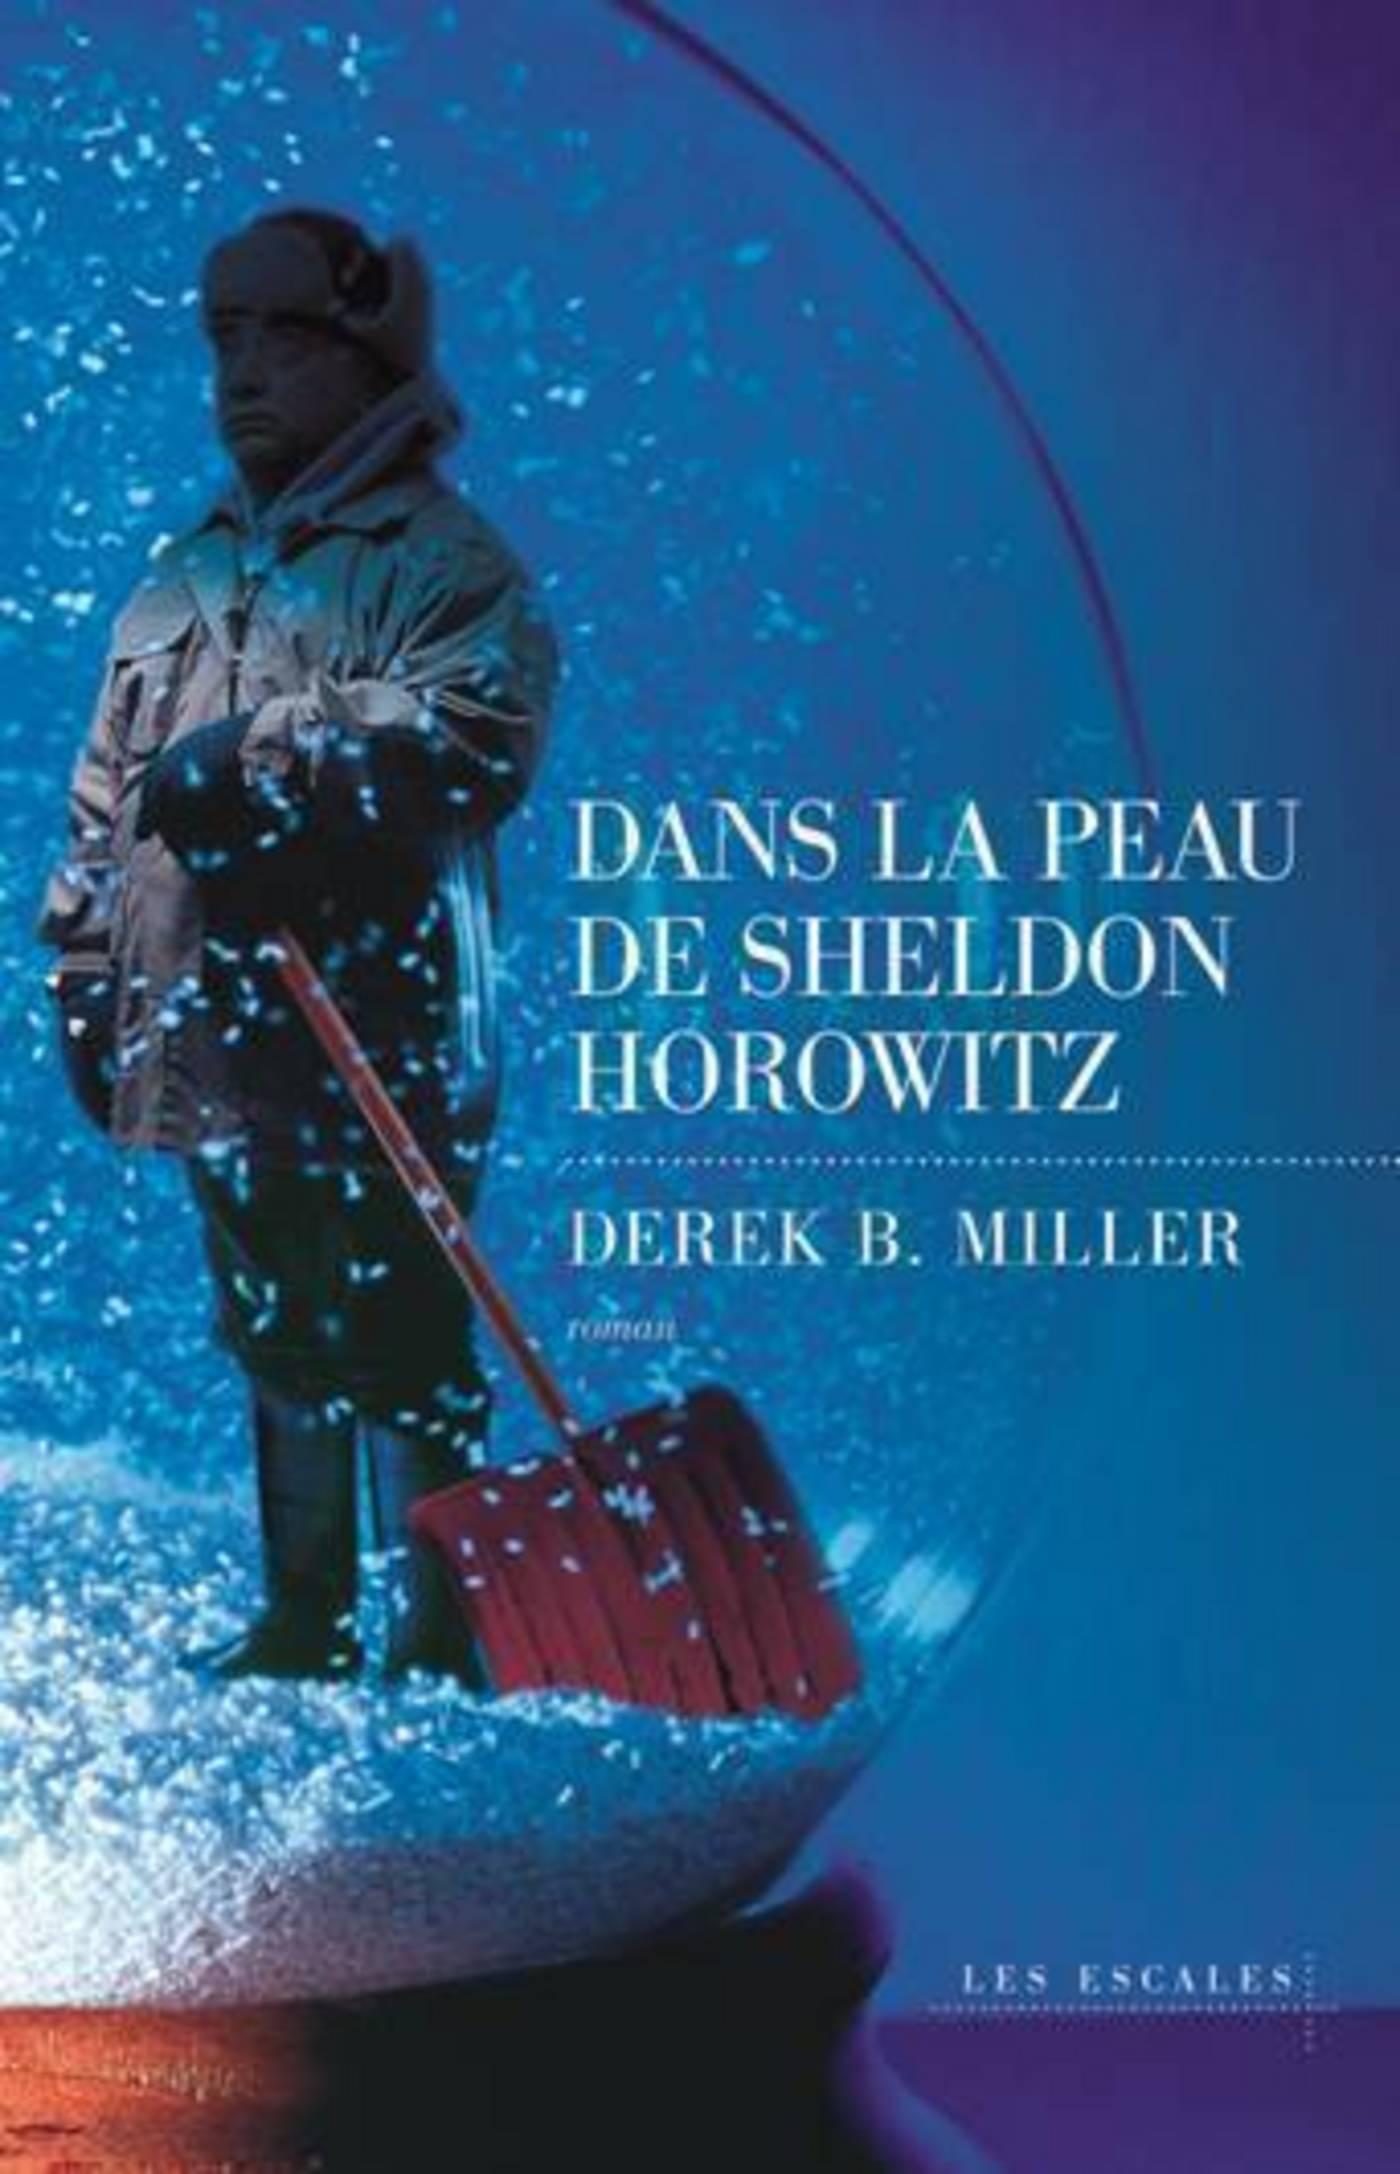 Dans la peau de Sheldon Horowitz | MILLER, Derek B.